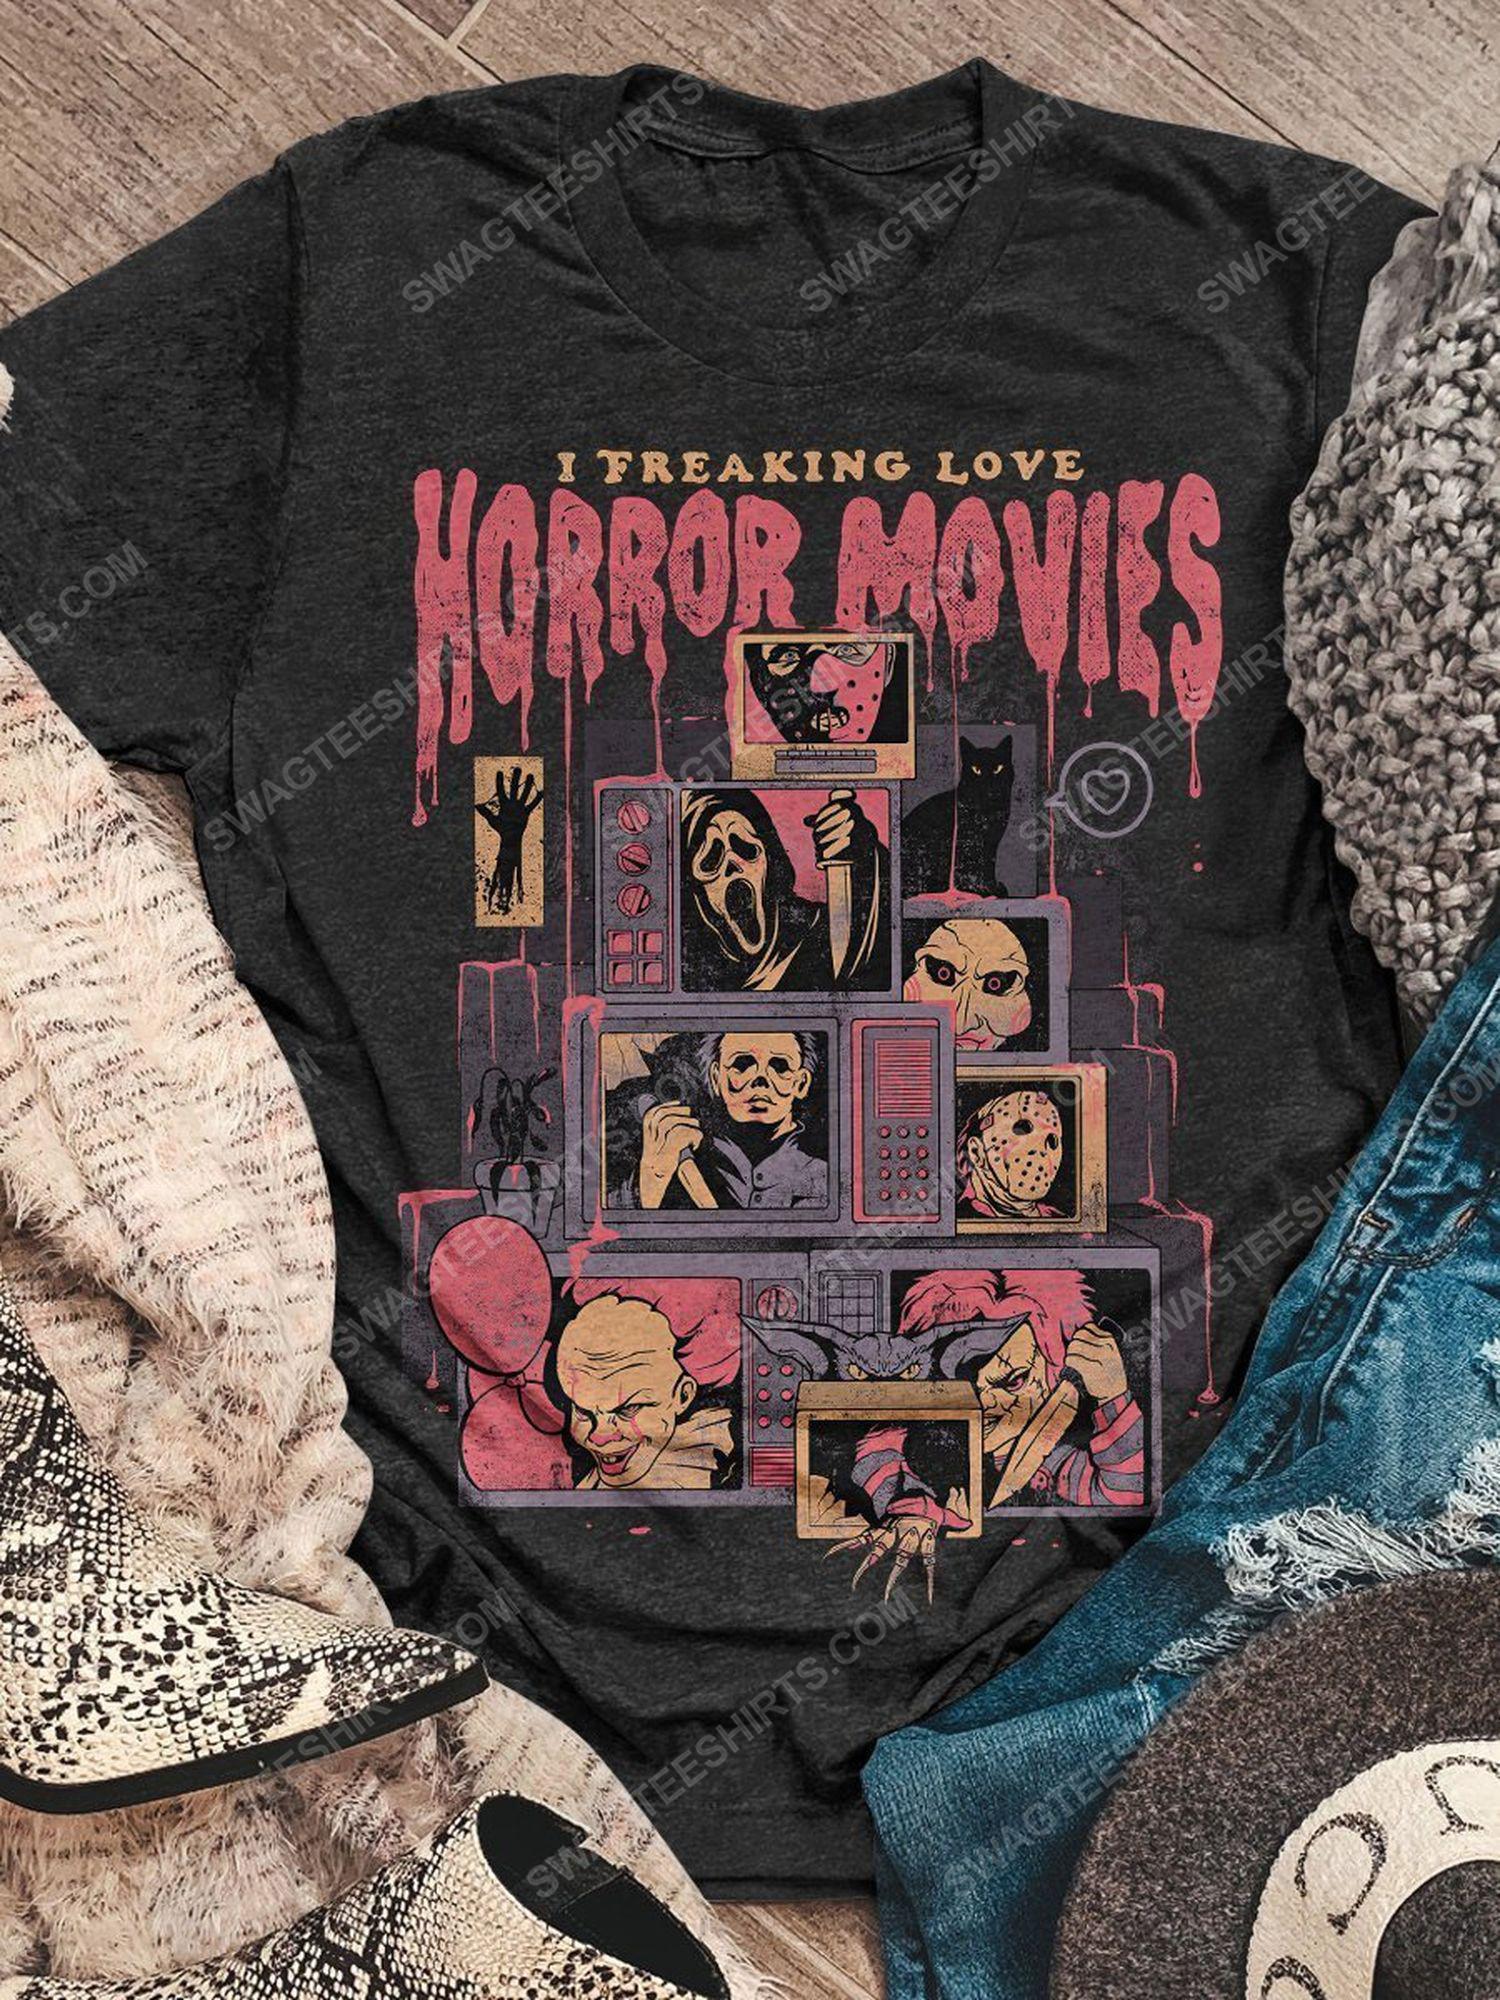 Halloween i freaking love horror movies vintage shirt 1